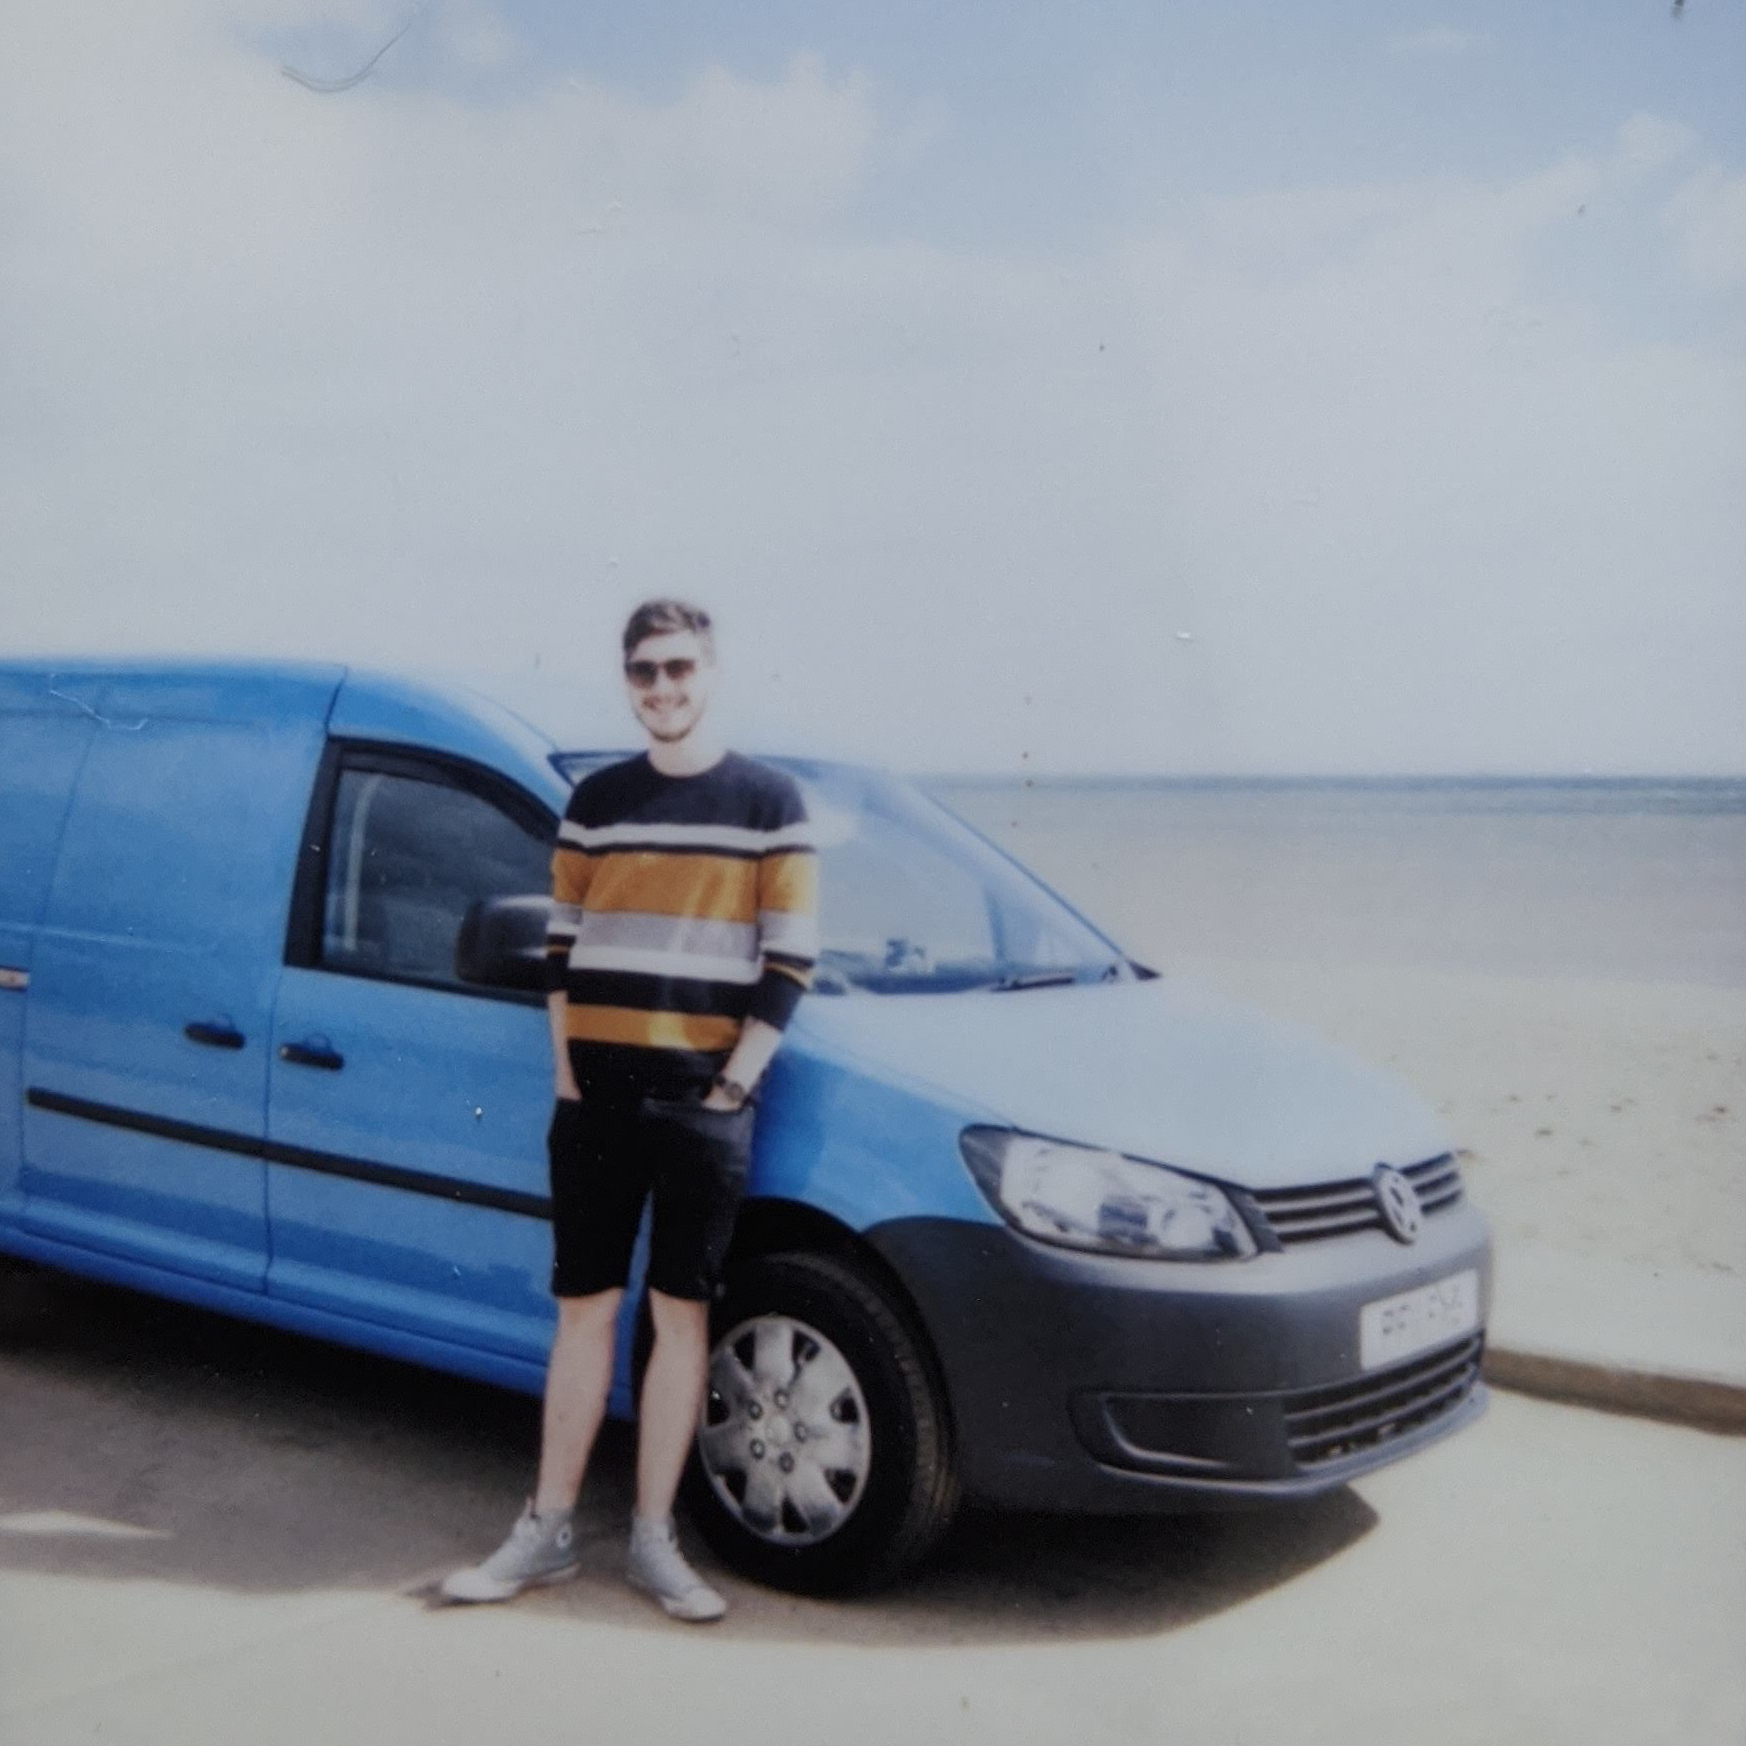 VW Caddy Maxi panel van on the beach